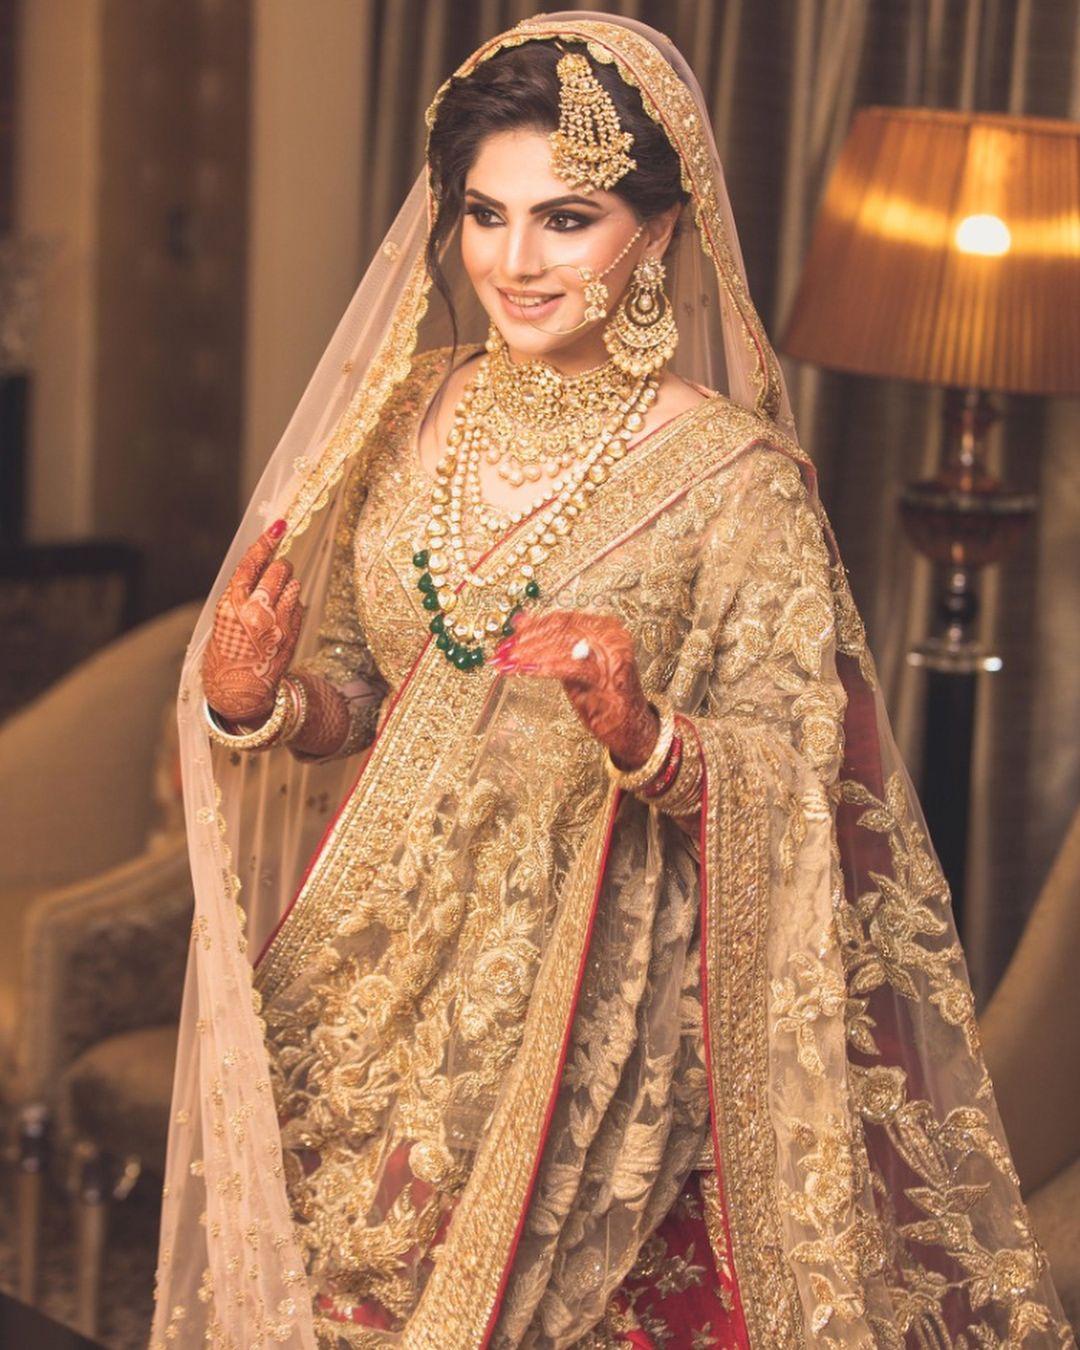 Wedding dress jewelry  This Muslim Bride recreated the look of Anushkaus Sharma